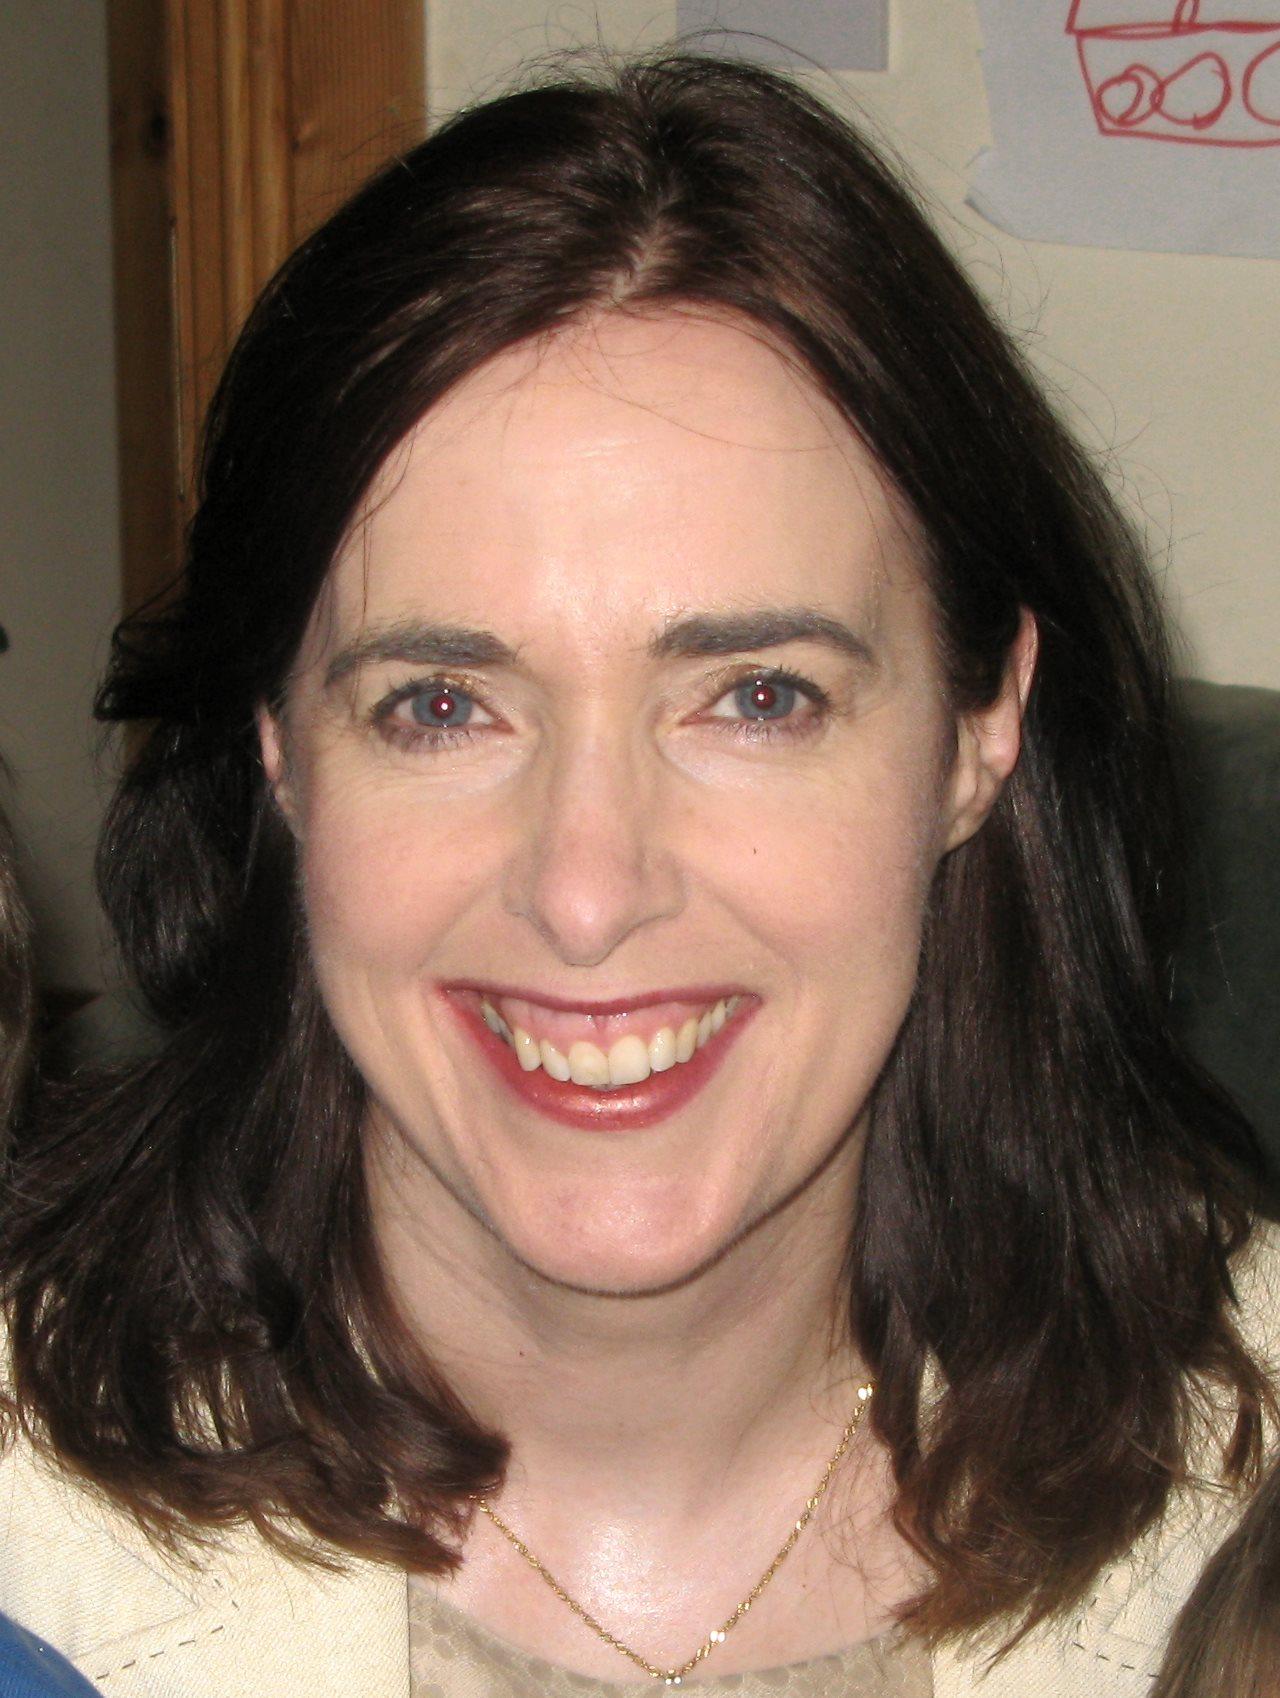 Cathy McHugh